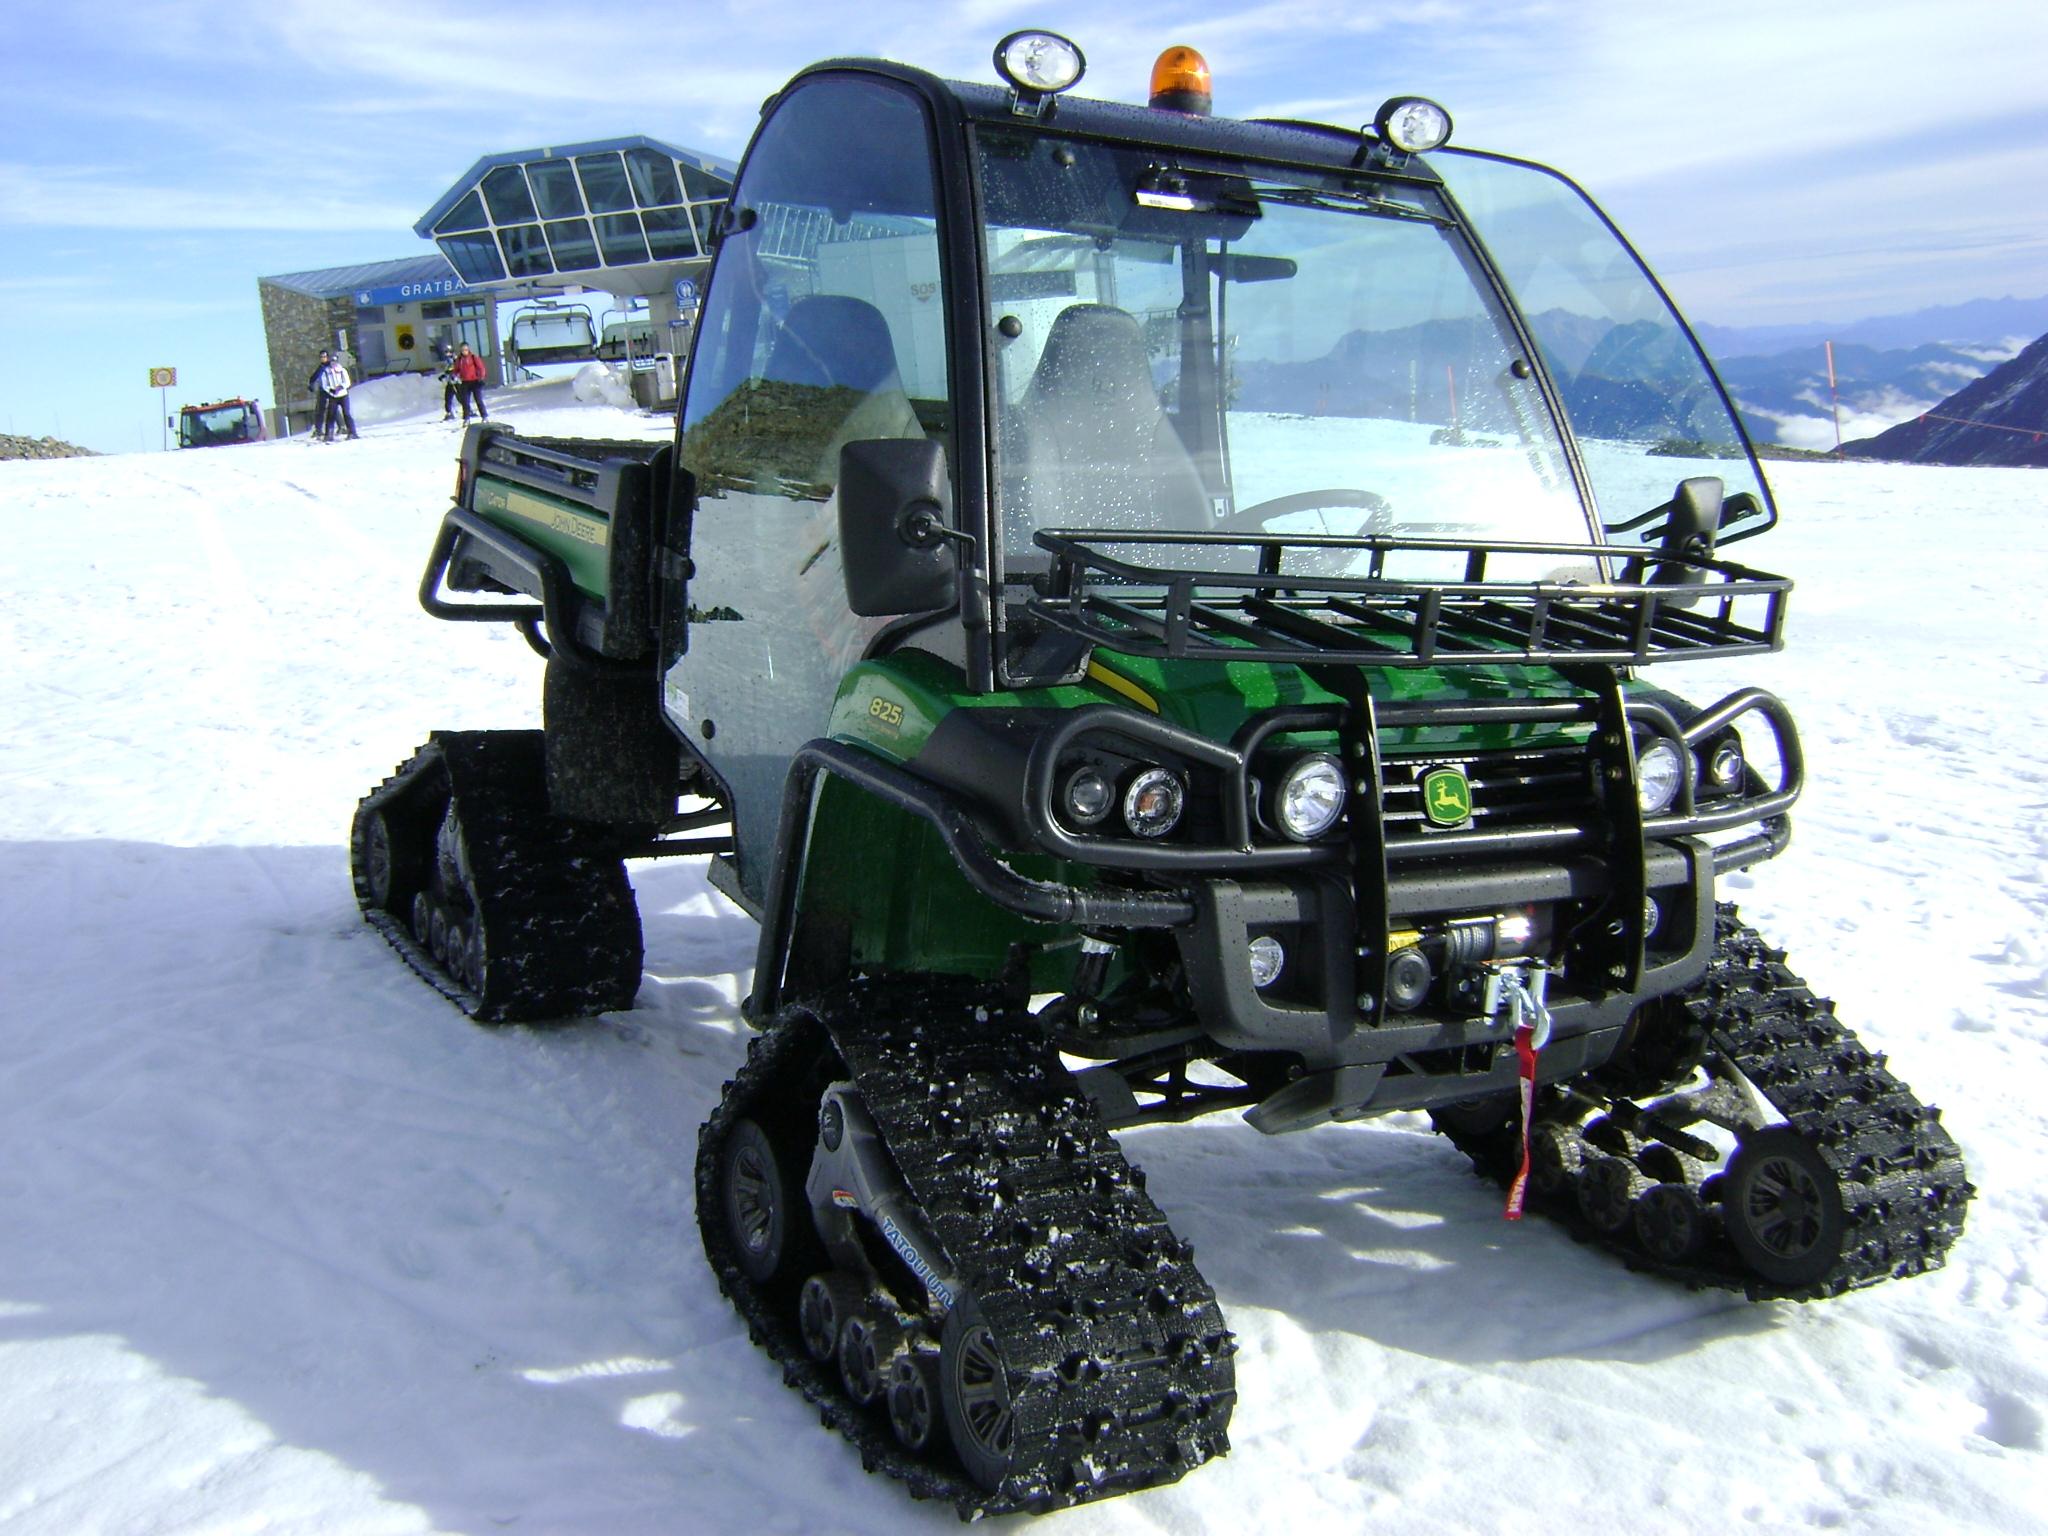 John Deere Gator >> JOHN-DEERE GATOR jetzt auch mit Winterausrüstung. - LMB Landmaschinen Burtscher Nüziders